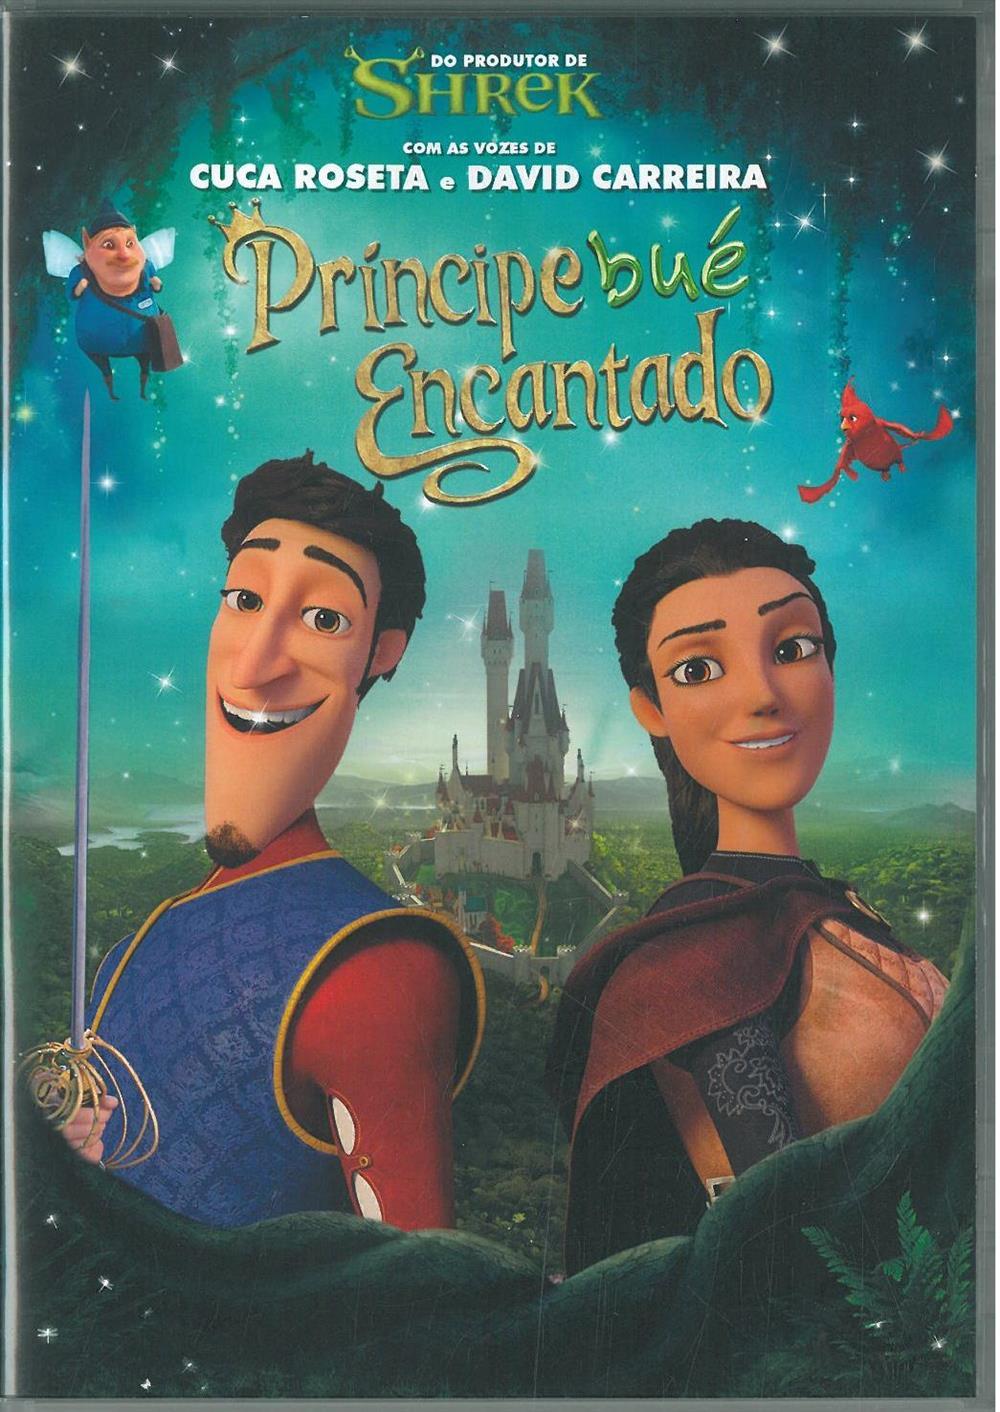 Príncipe bué encantado_DVD.jpg